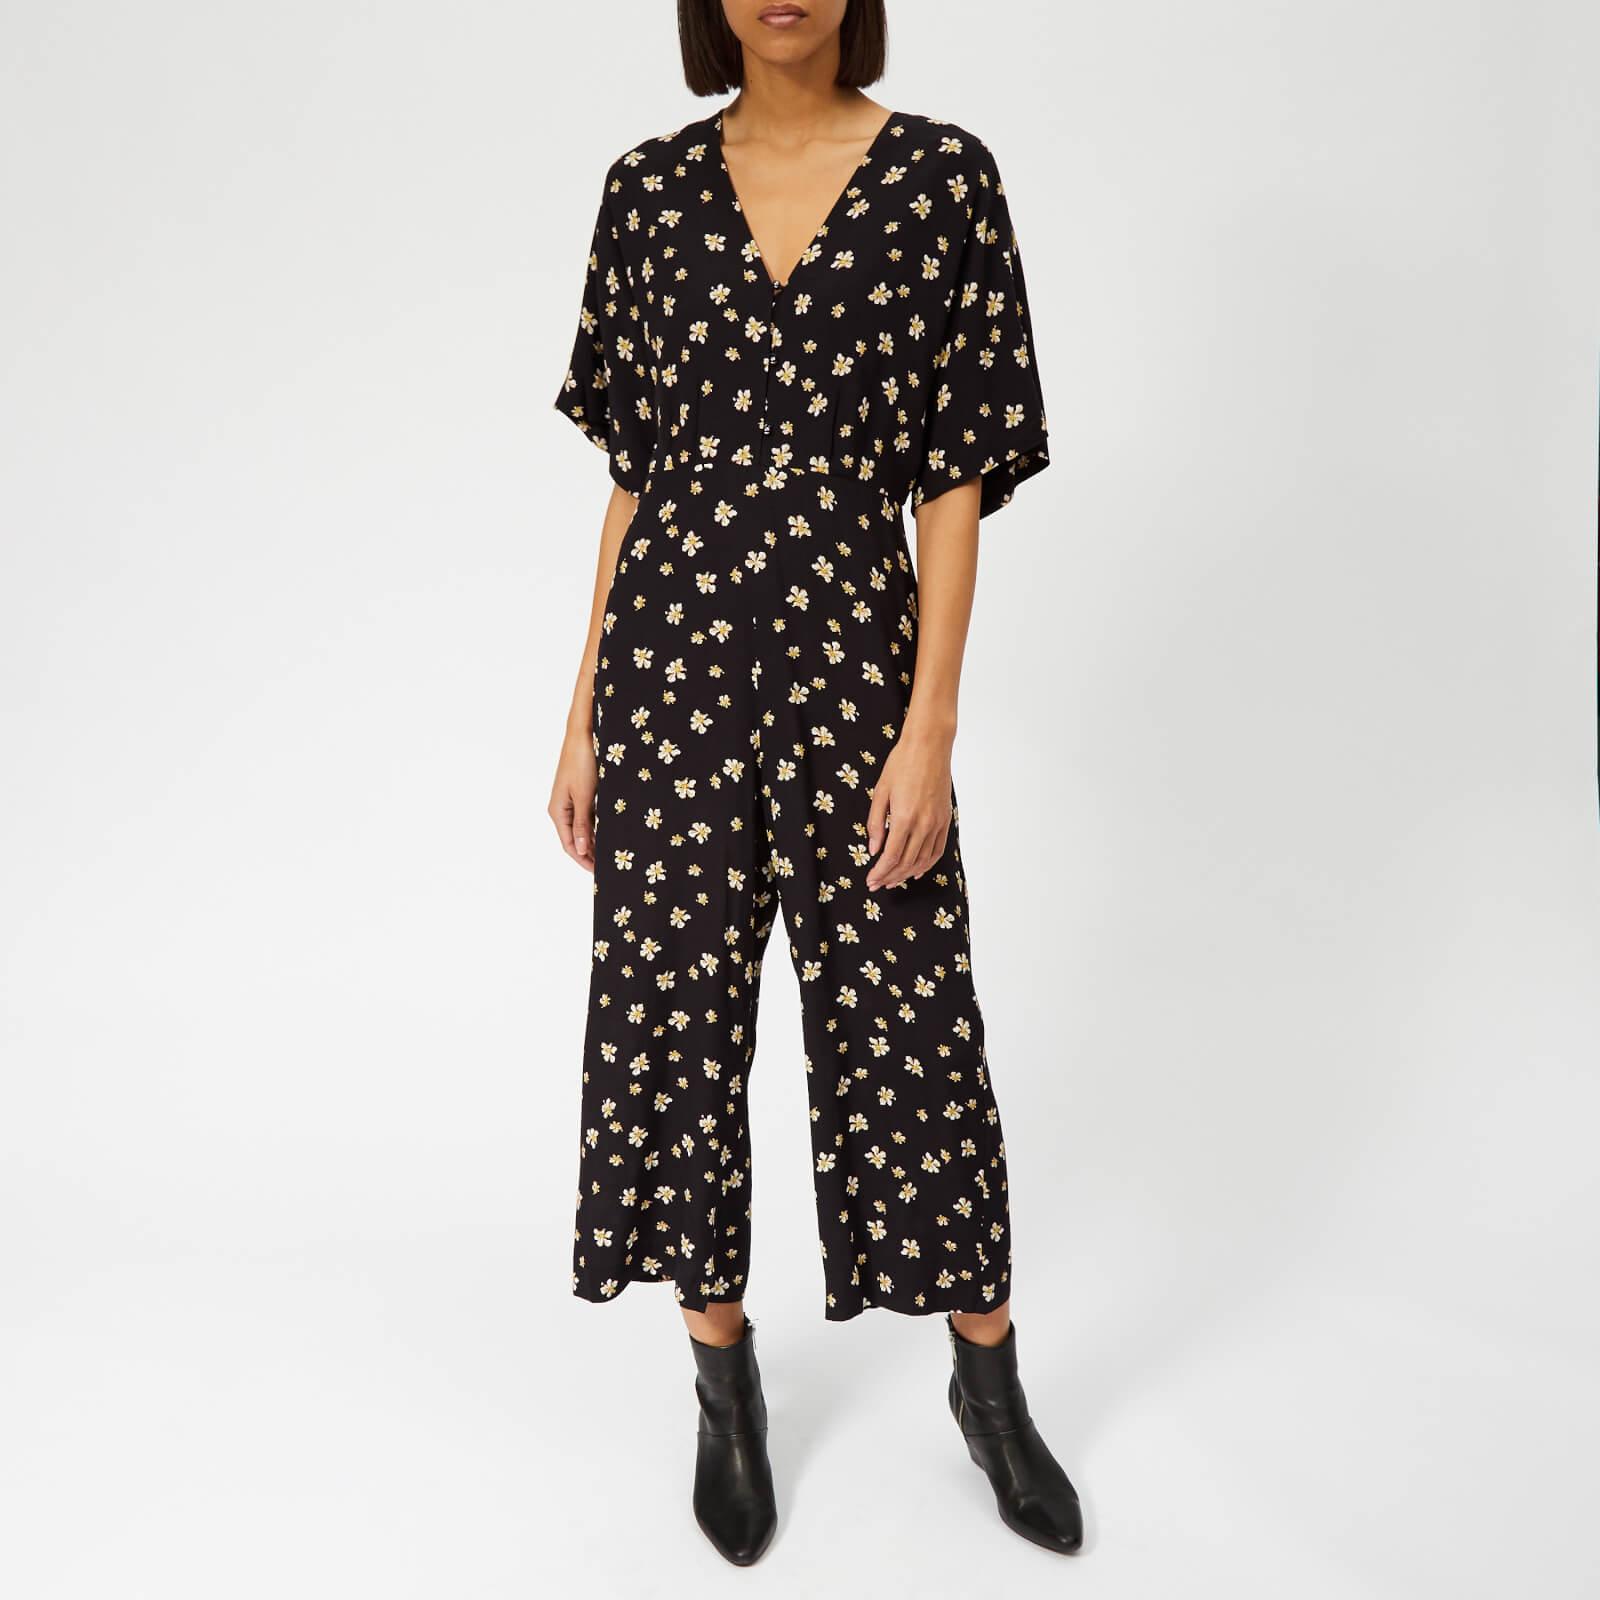 Whistles Women's Edelweiss Print Button Jumpsuit - Black/Multi - UK 6 - Black